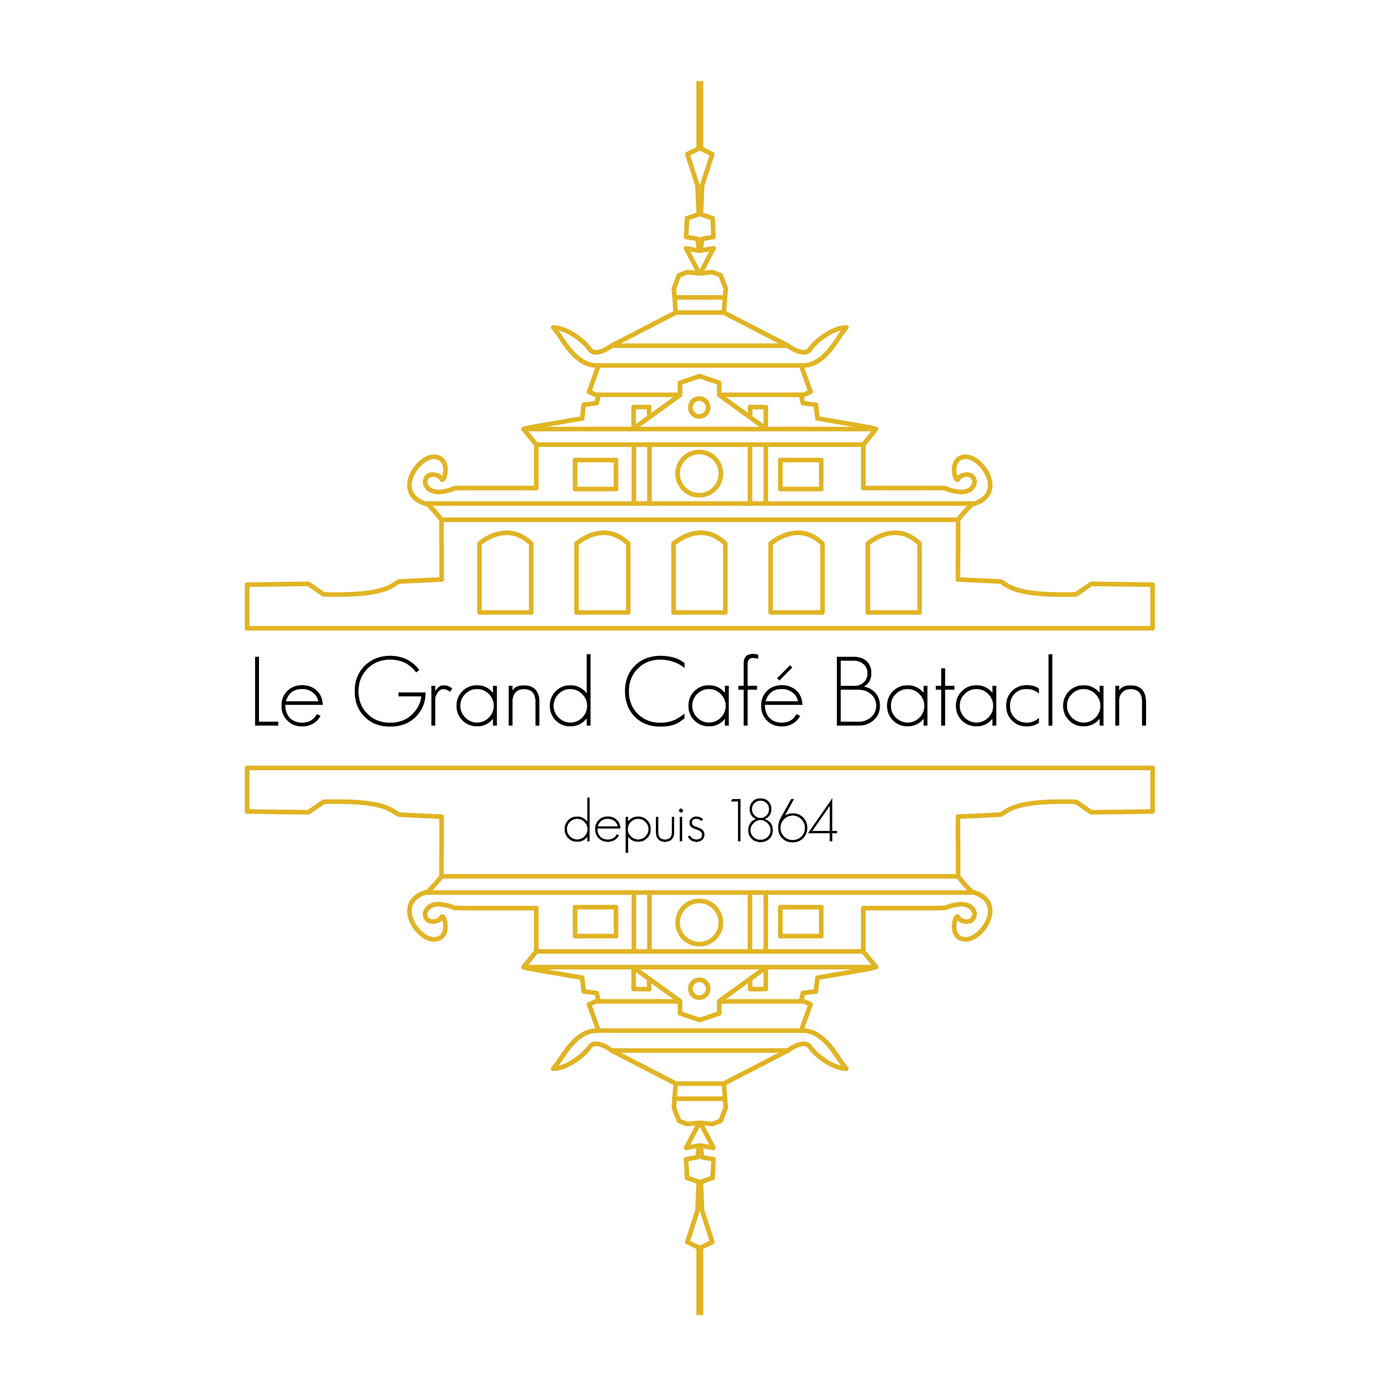 Paris Bataclan cafe restaurant logo